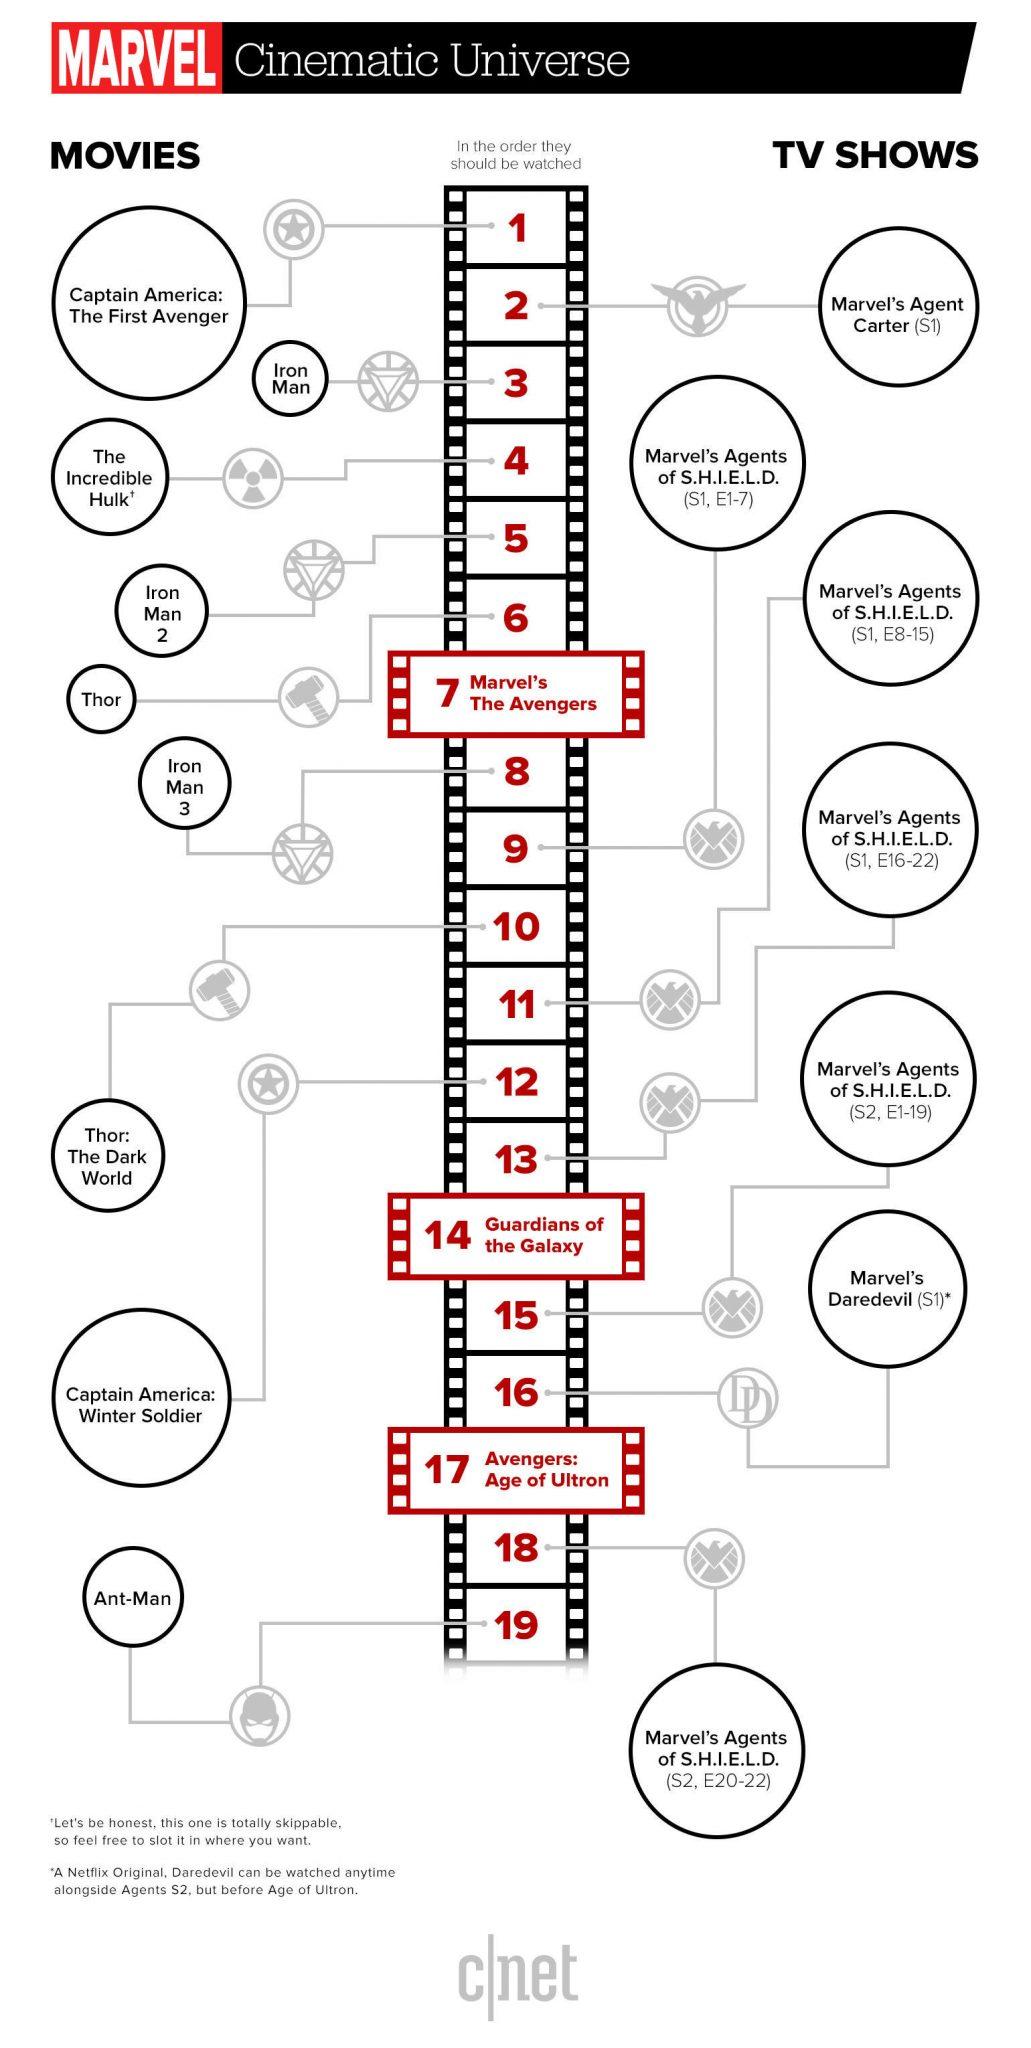 Movie marathons on netflix